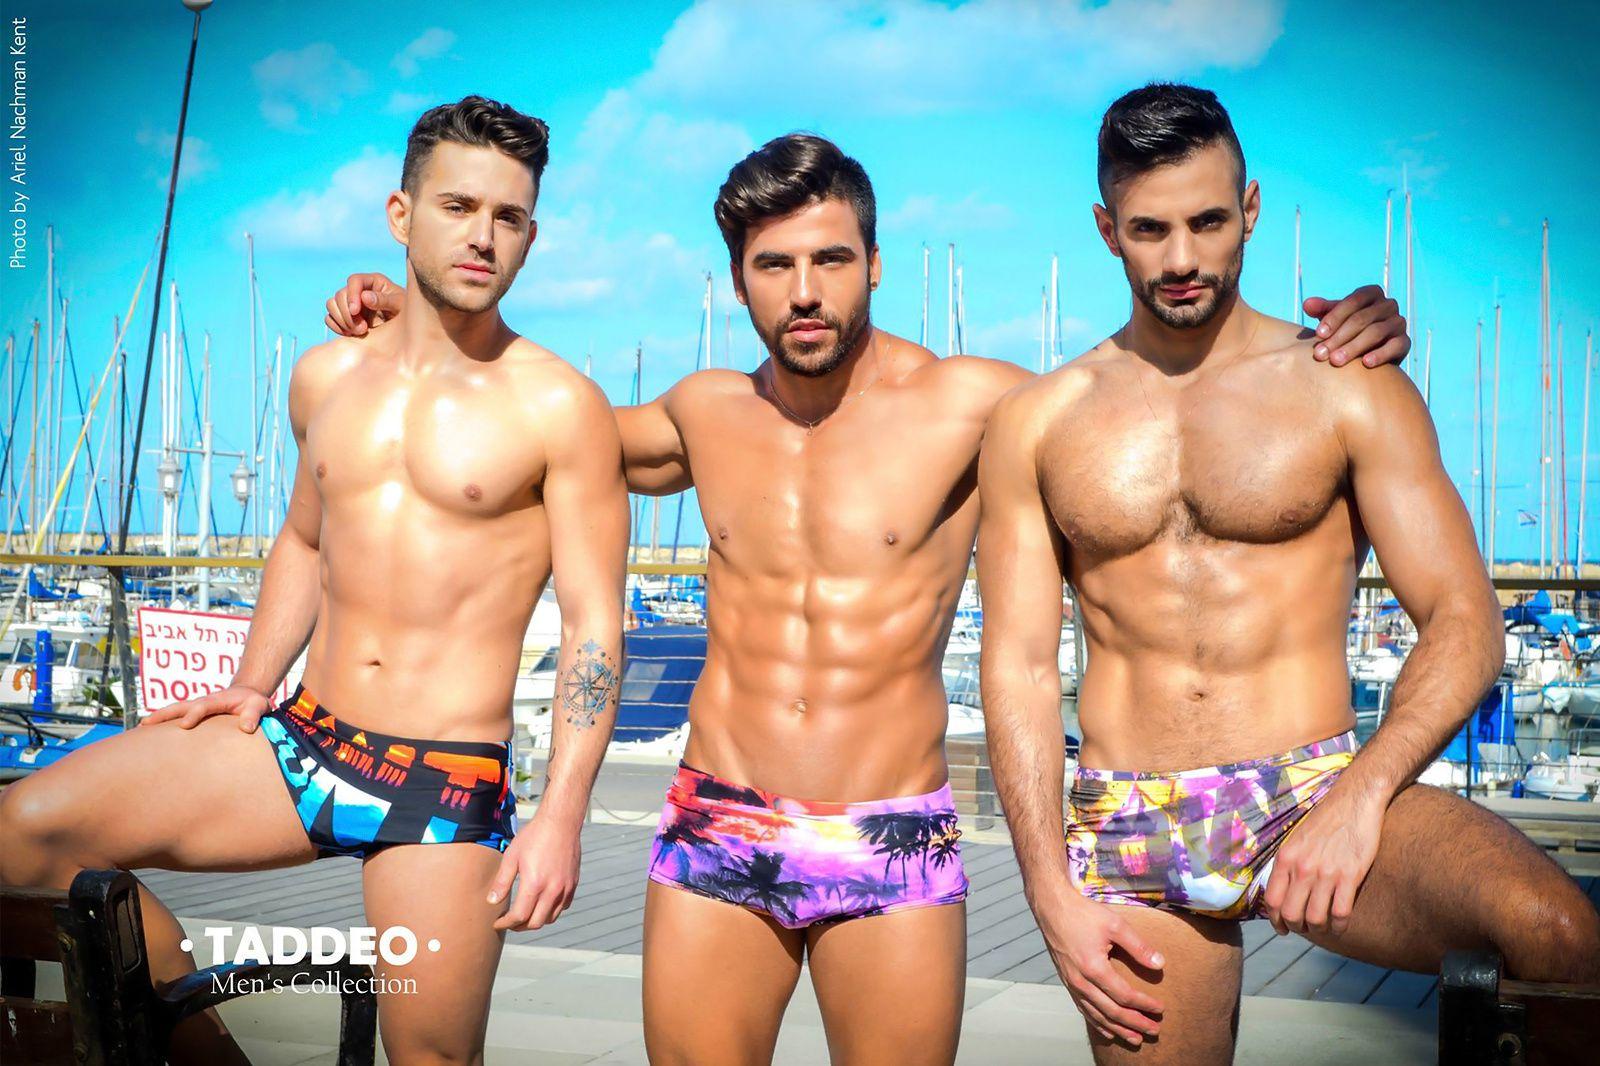 Introducing Taddeo : Men Underwear & Swimwear (1)